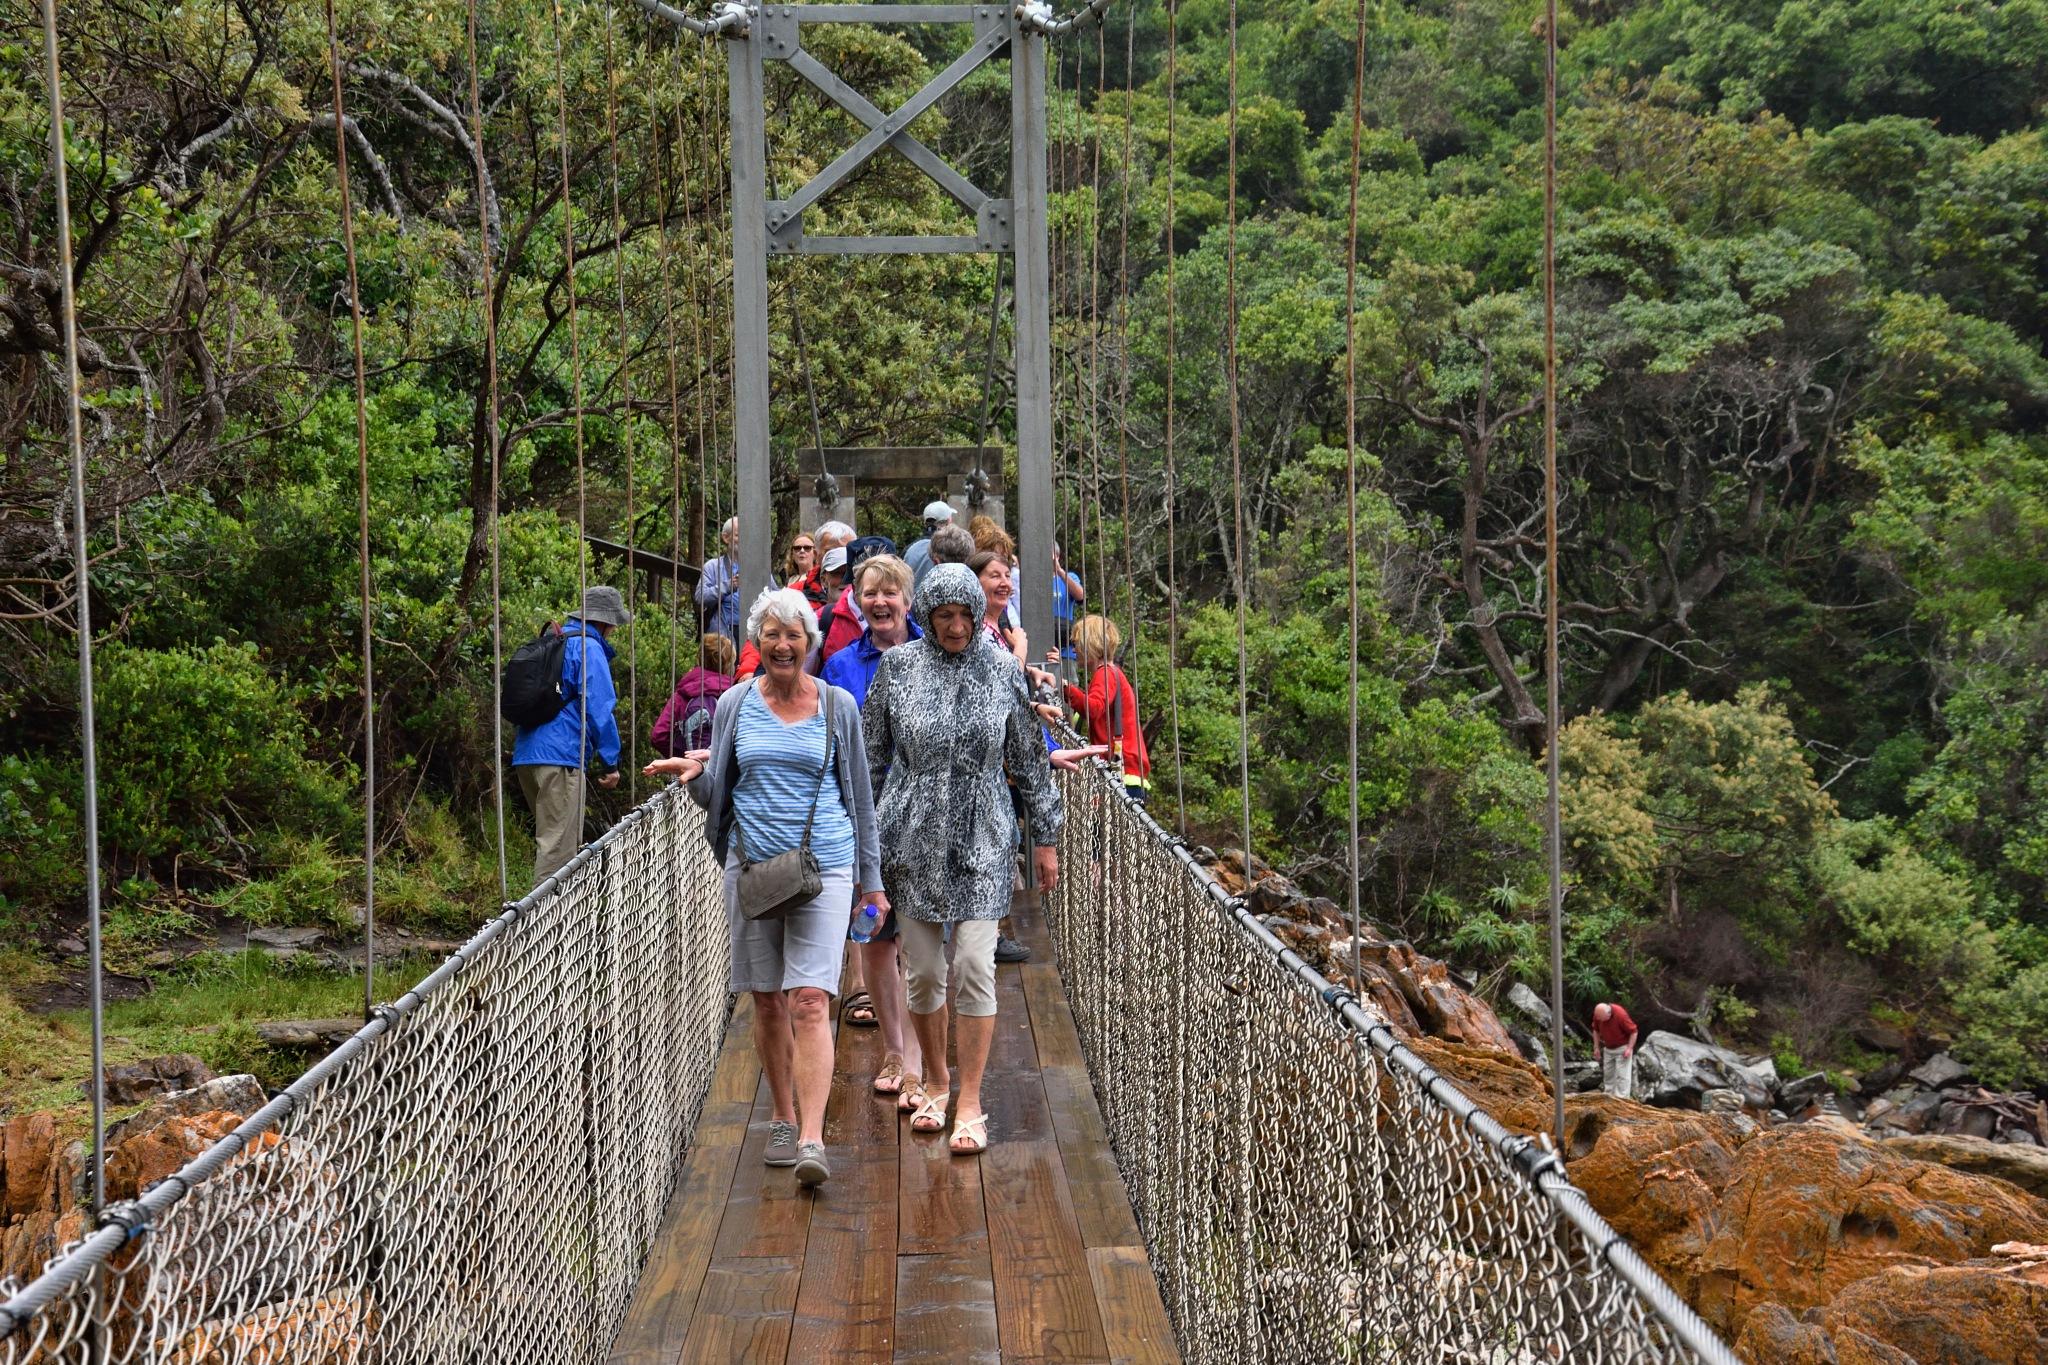 South Africa (249) Tsitsikamma National Park by Derek Clarke